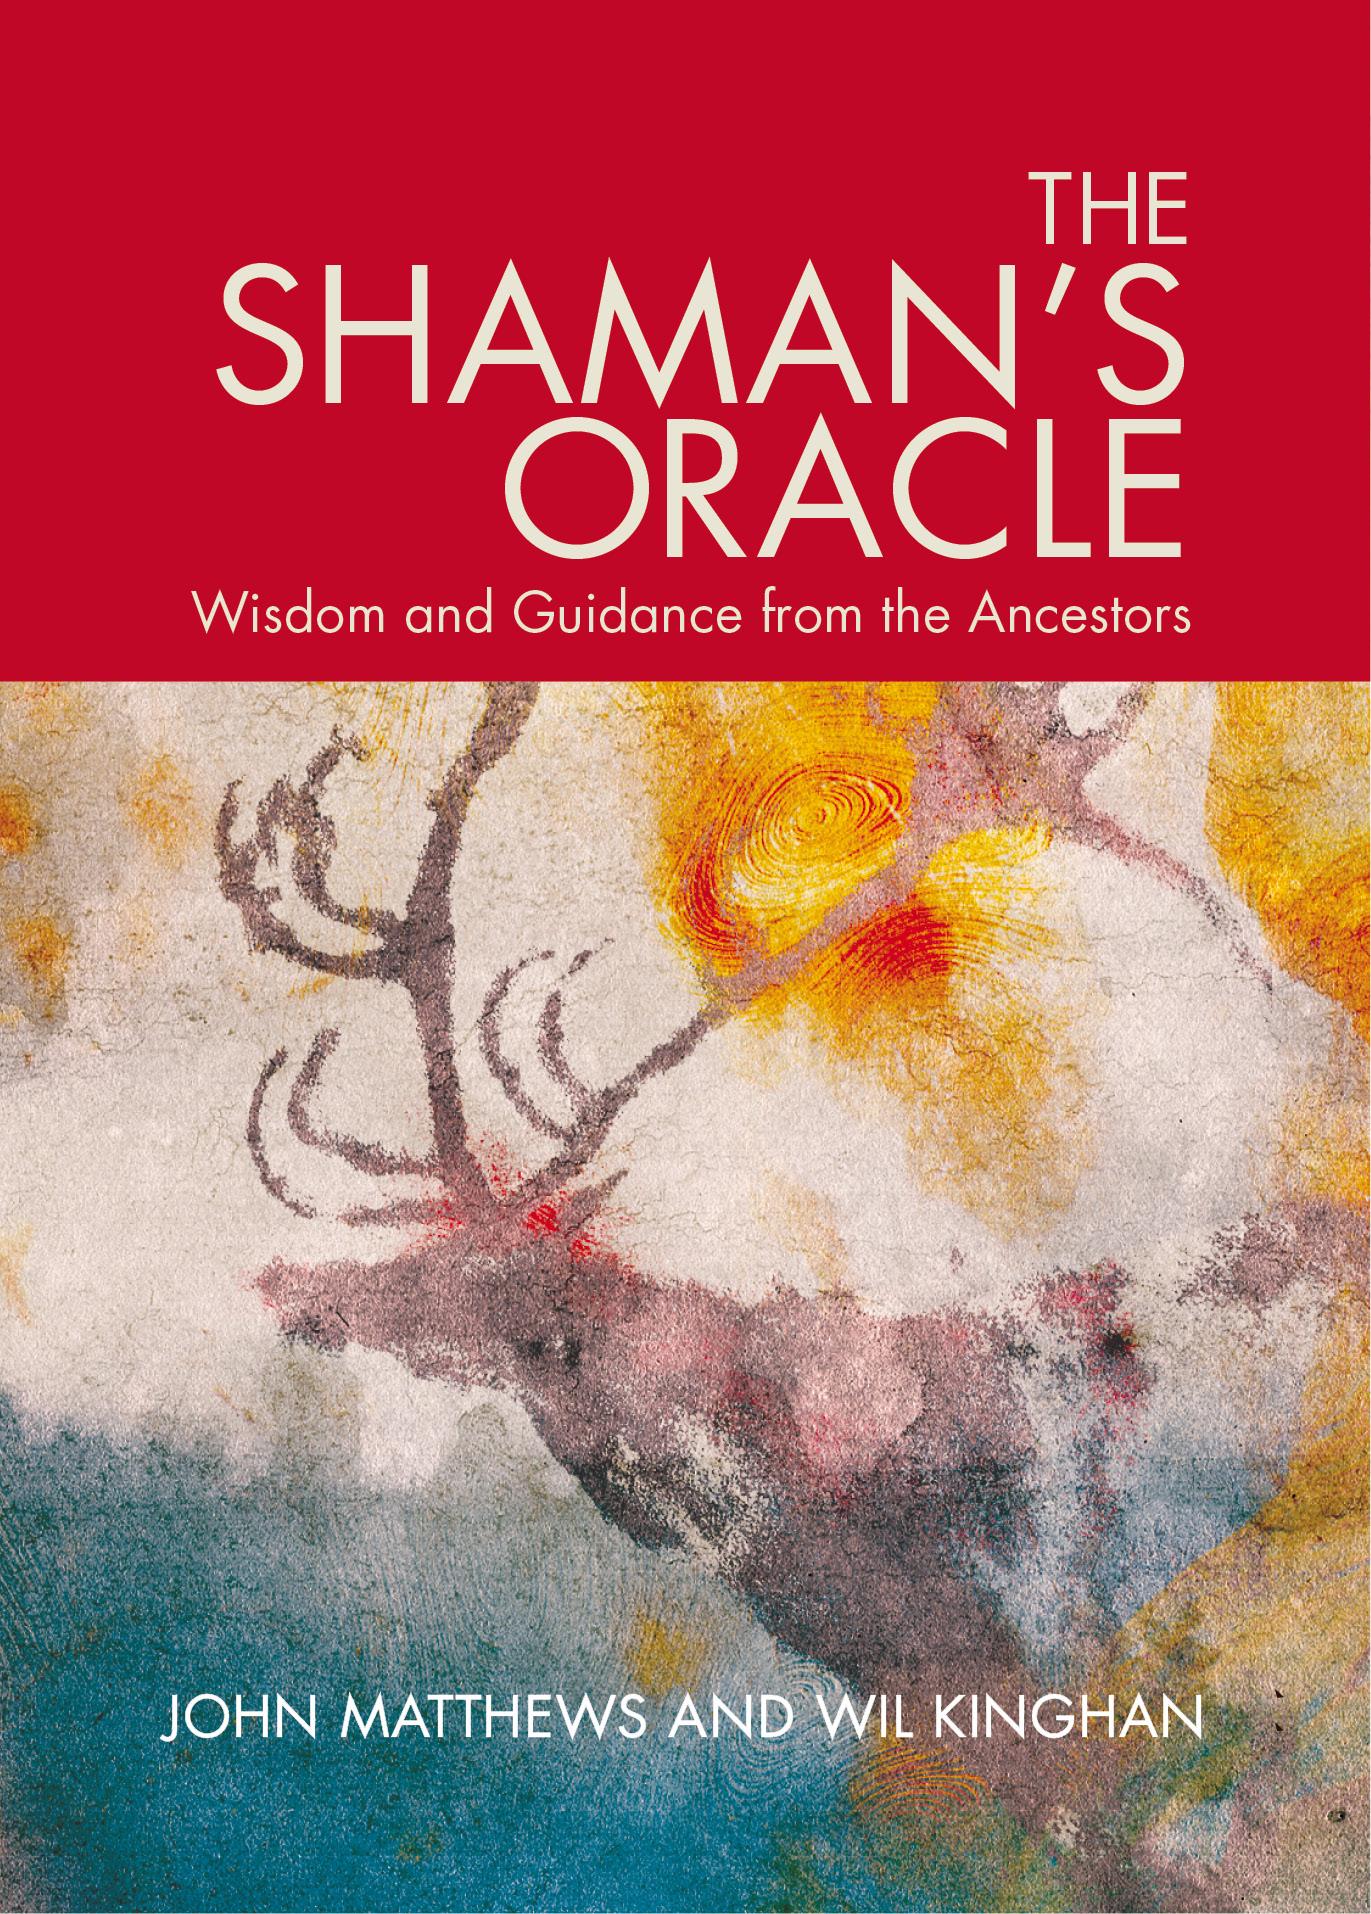 Schamans Oracle 9781780285238